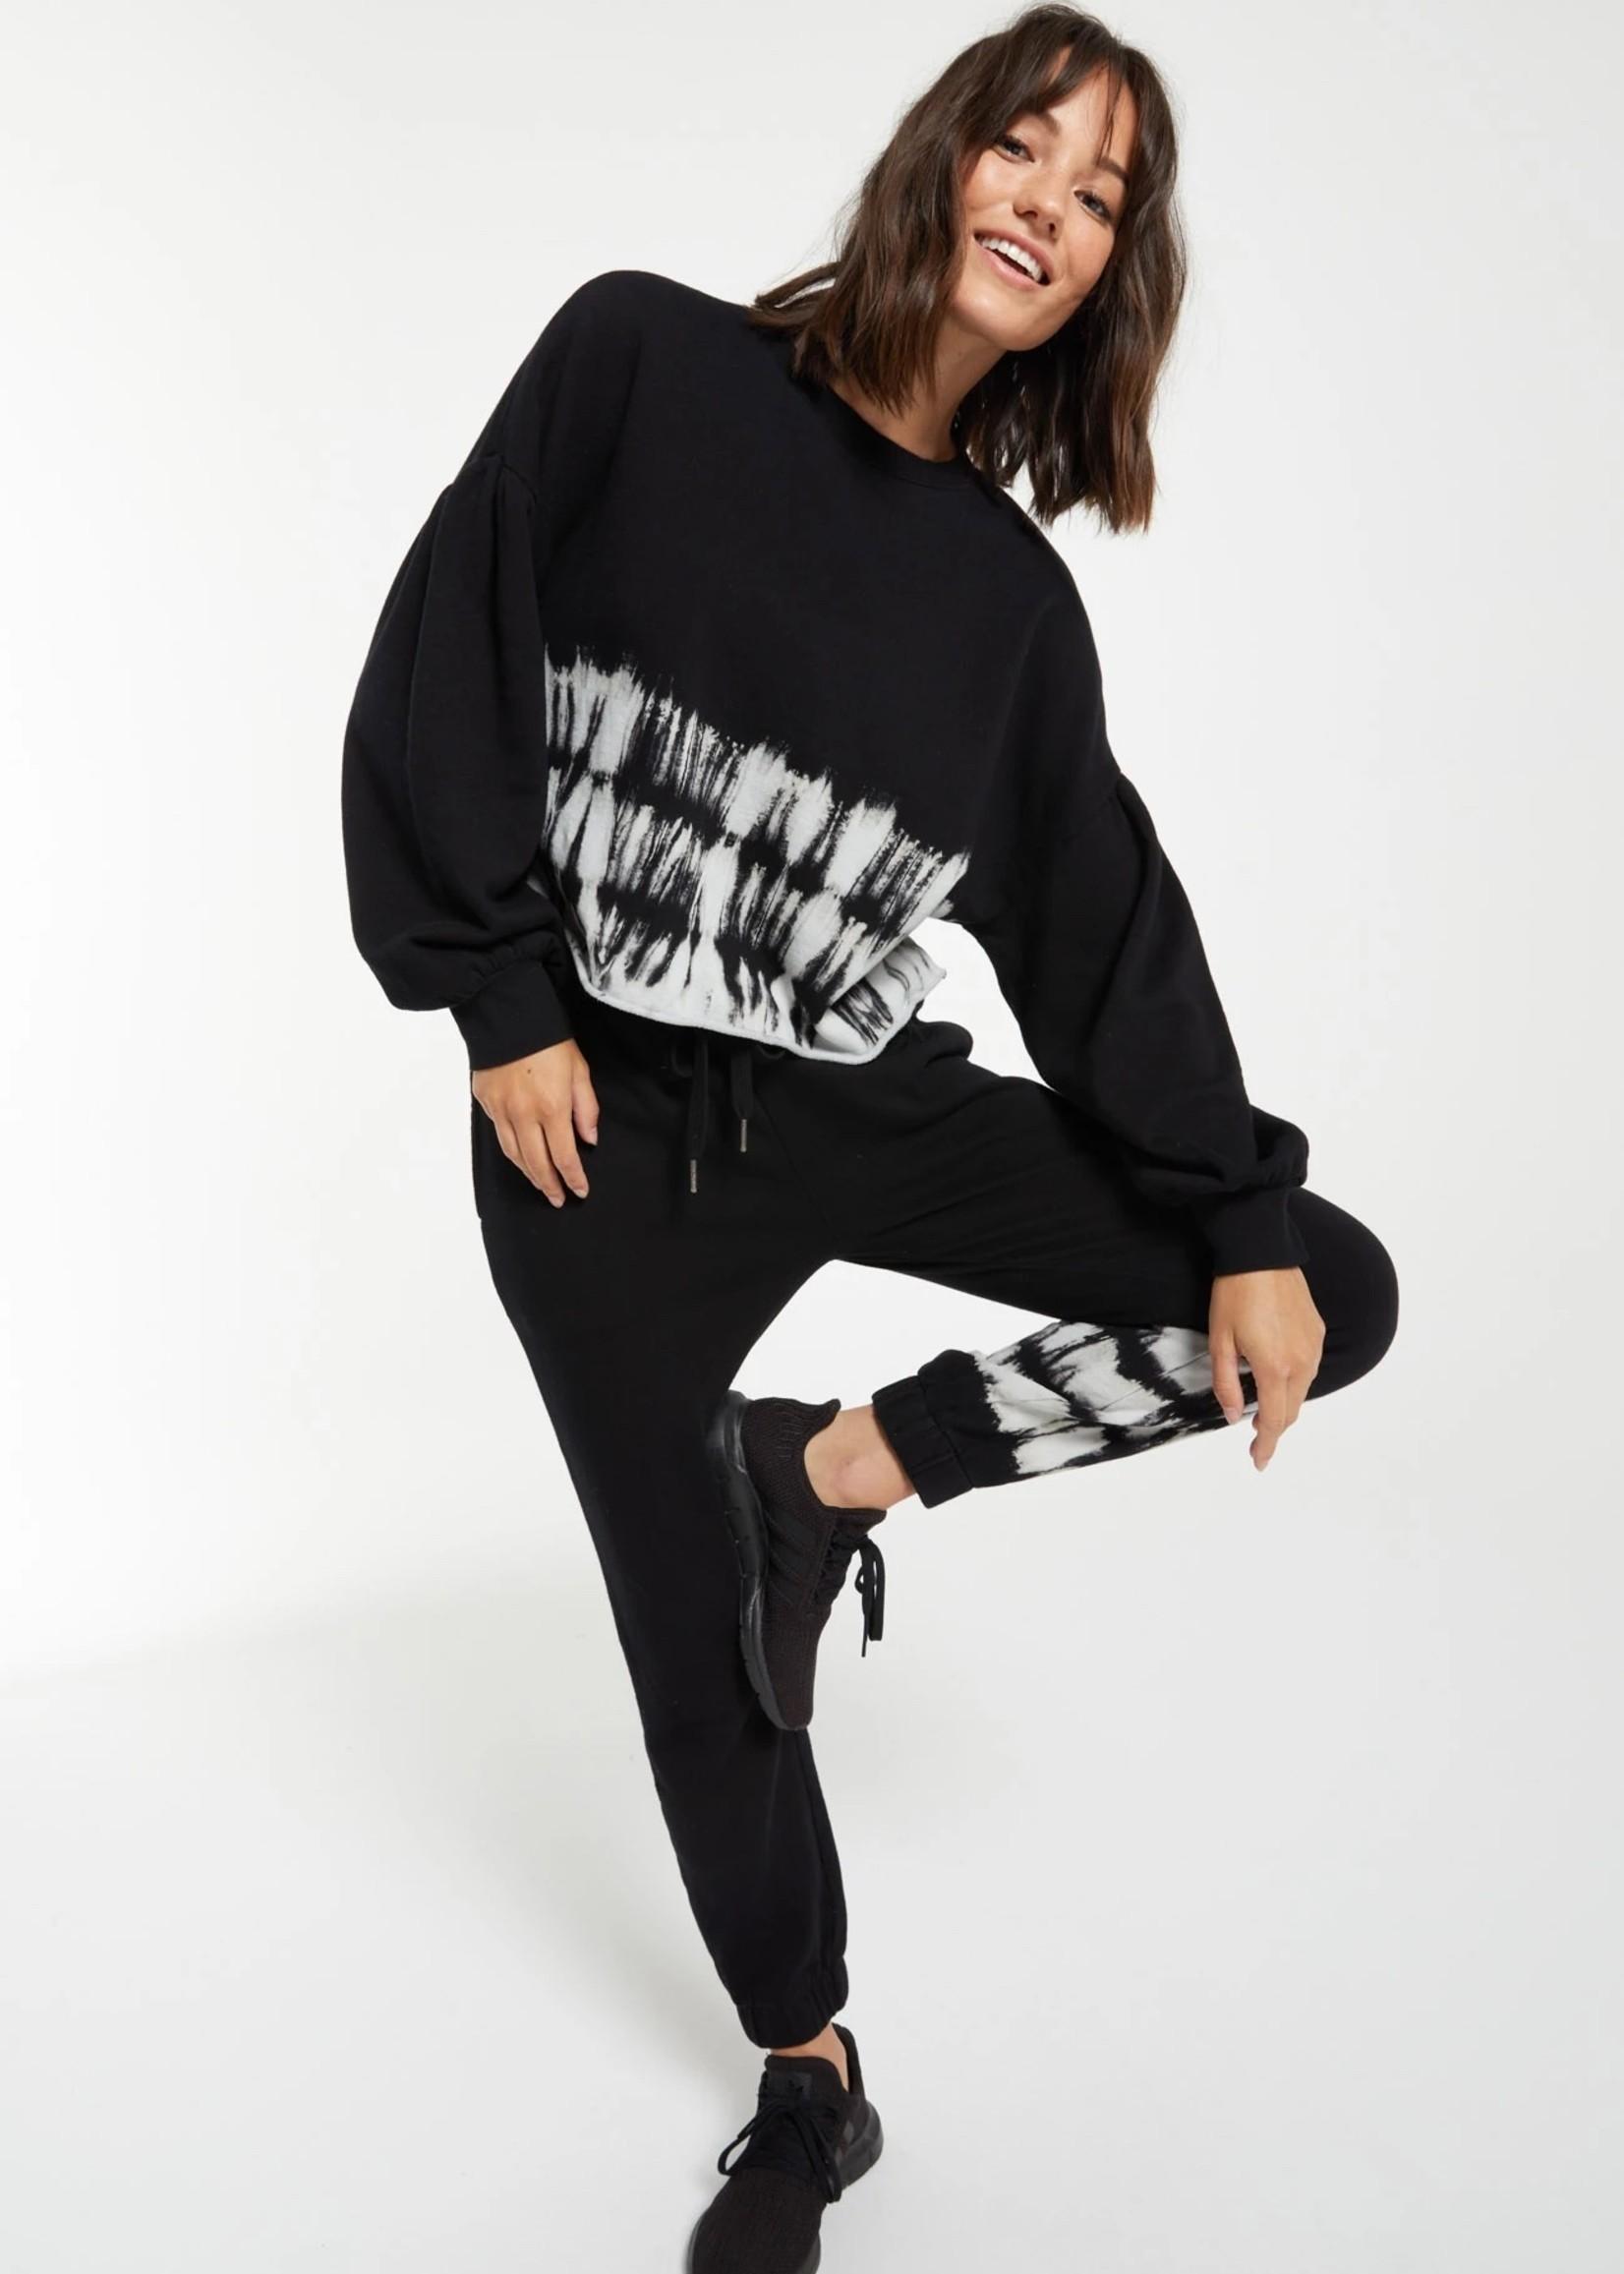 Z Supply Black & White Selene Stripe Tie Dye Jogger